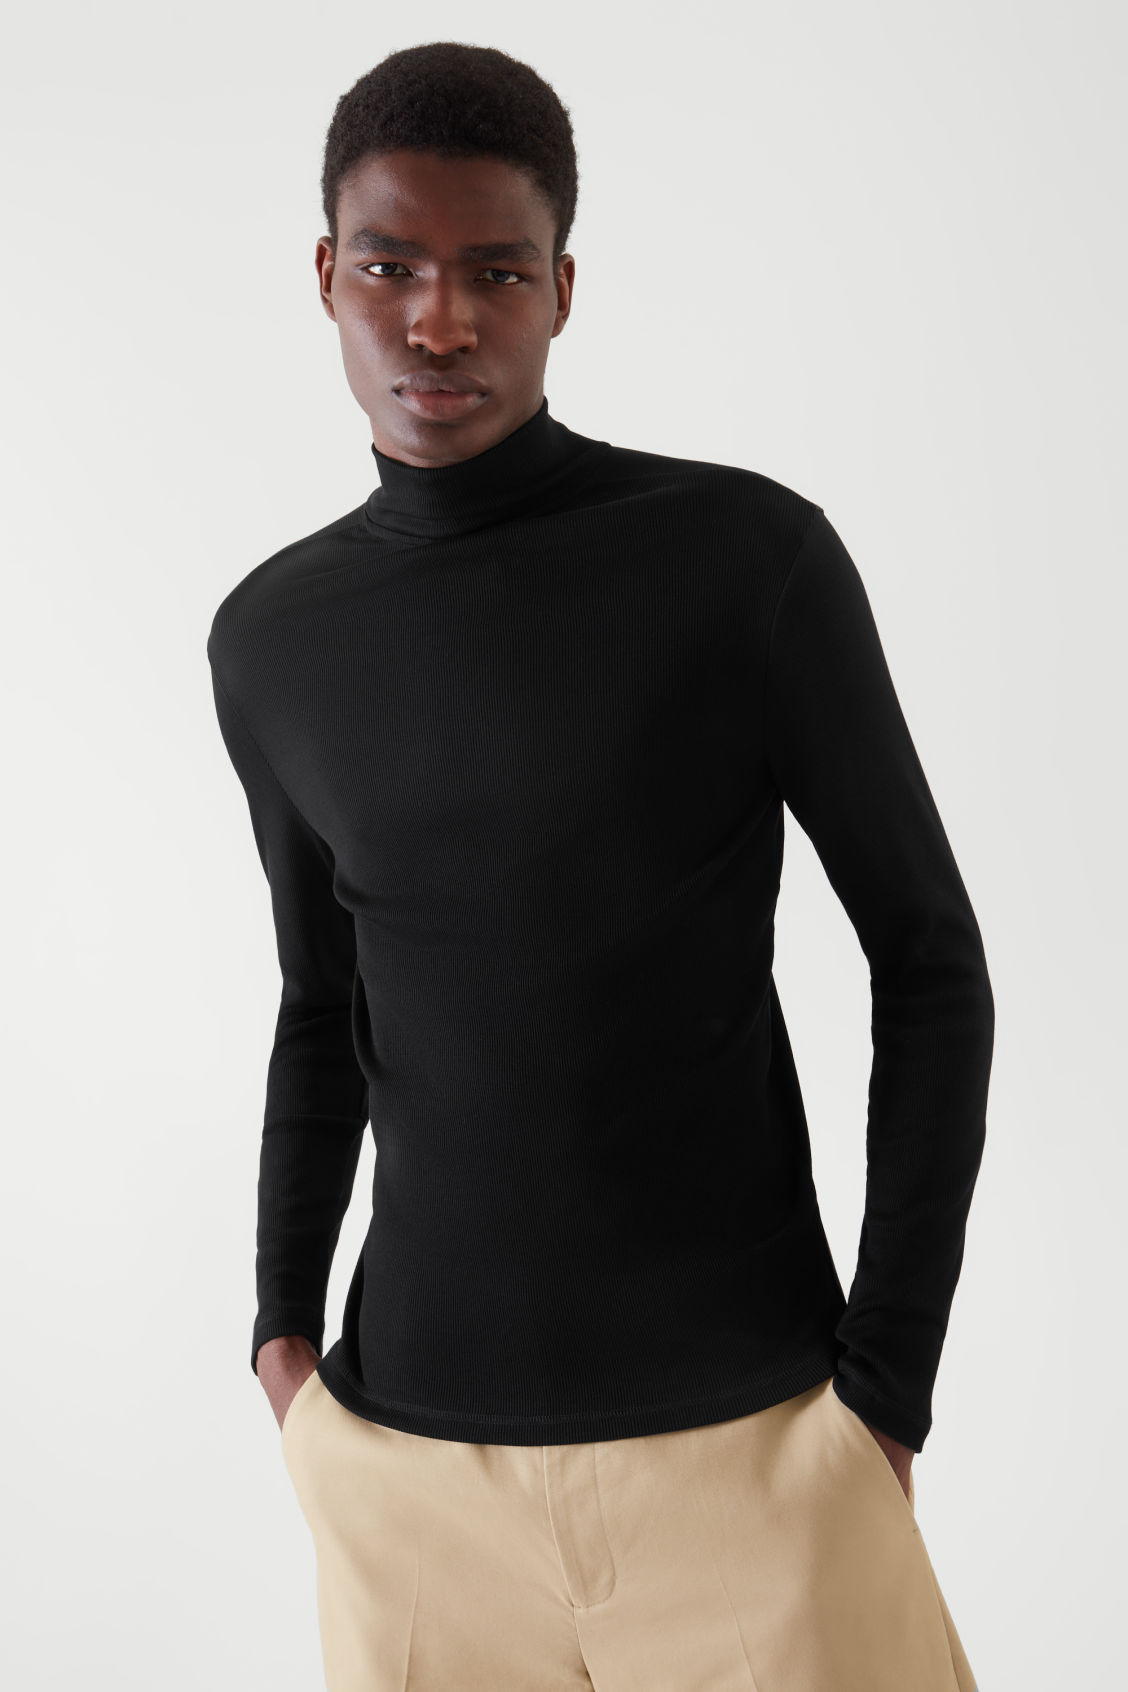 COS ROLL-NECK TOP,BLACK